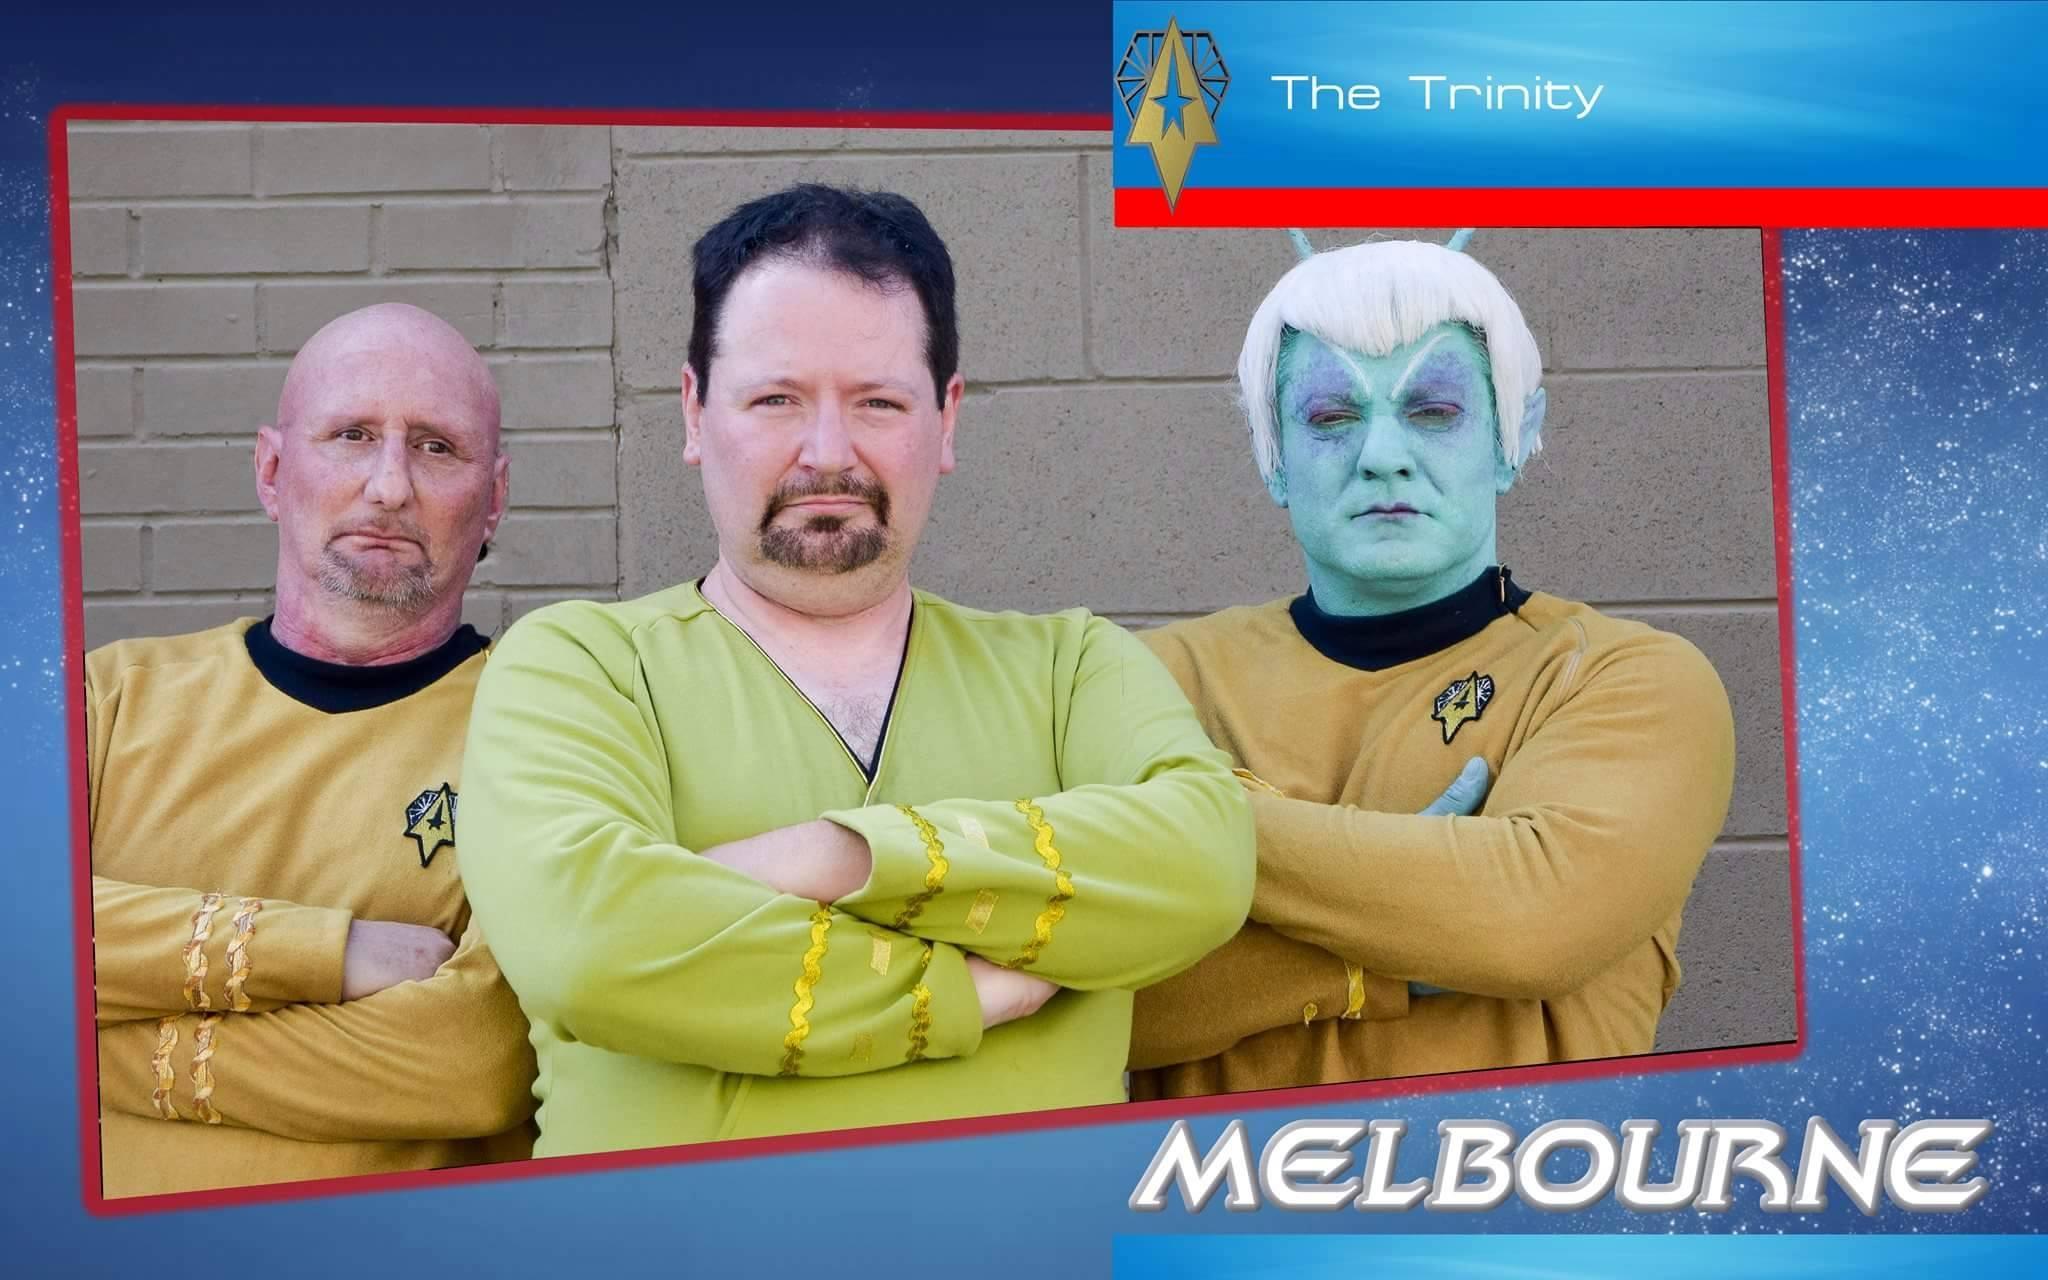 Melbourne starring cast